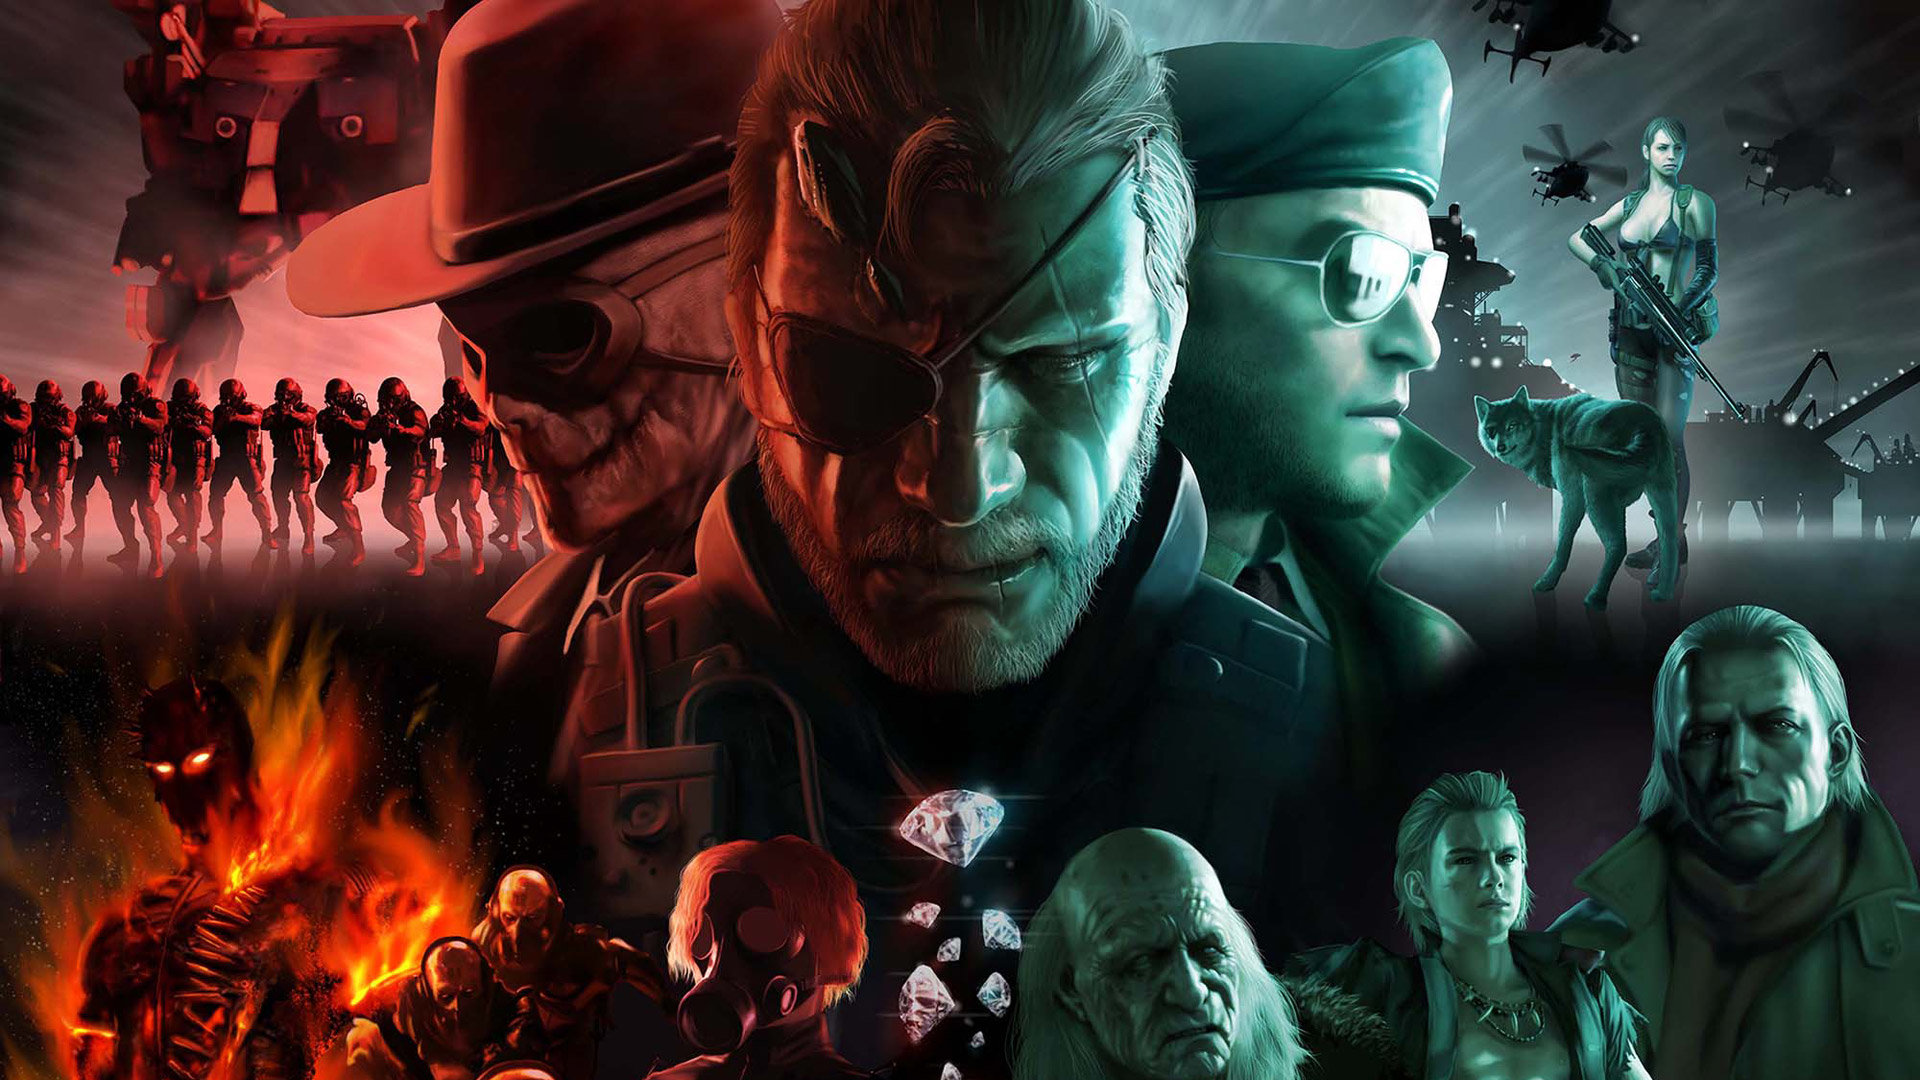 High Resolution Metal Gear Solid 5 V The Phantom Pain Mgsv 5